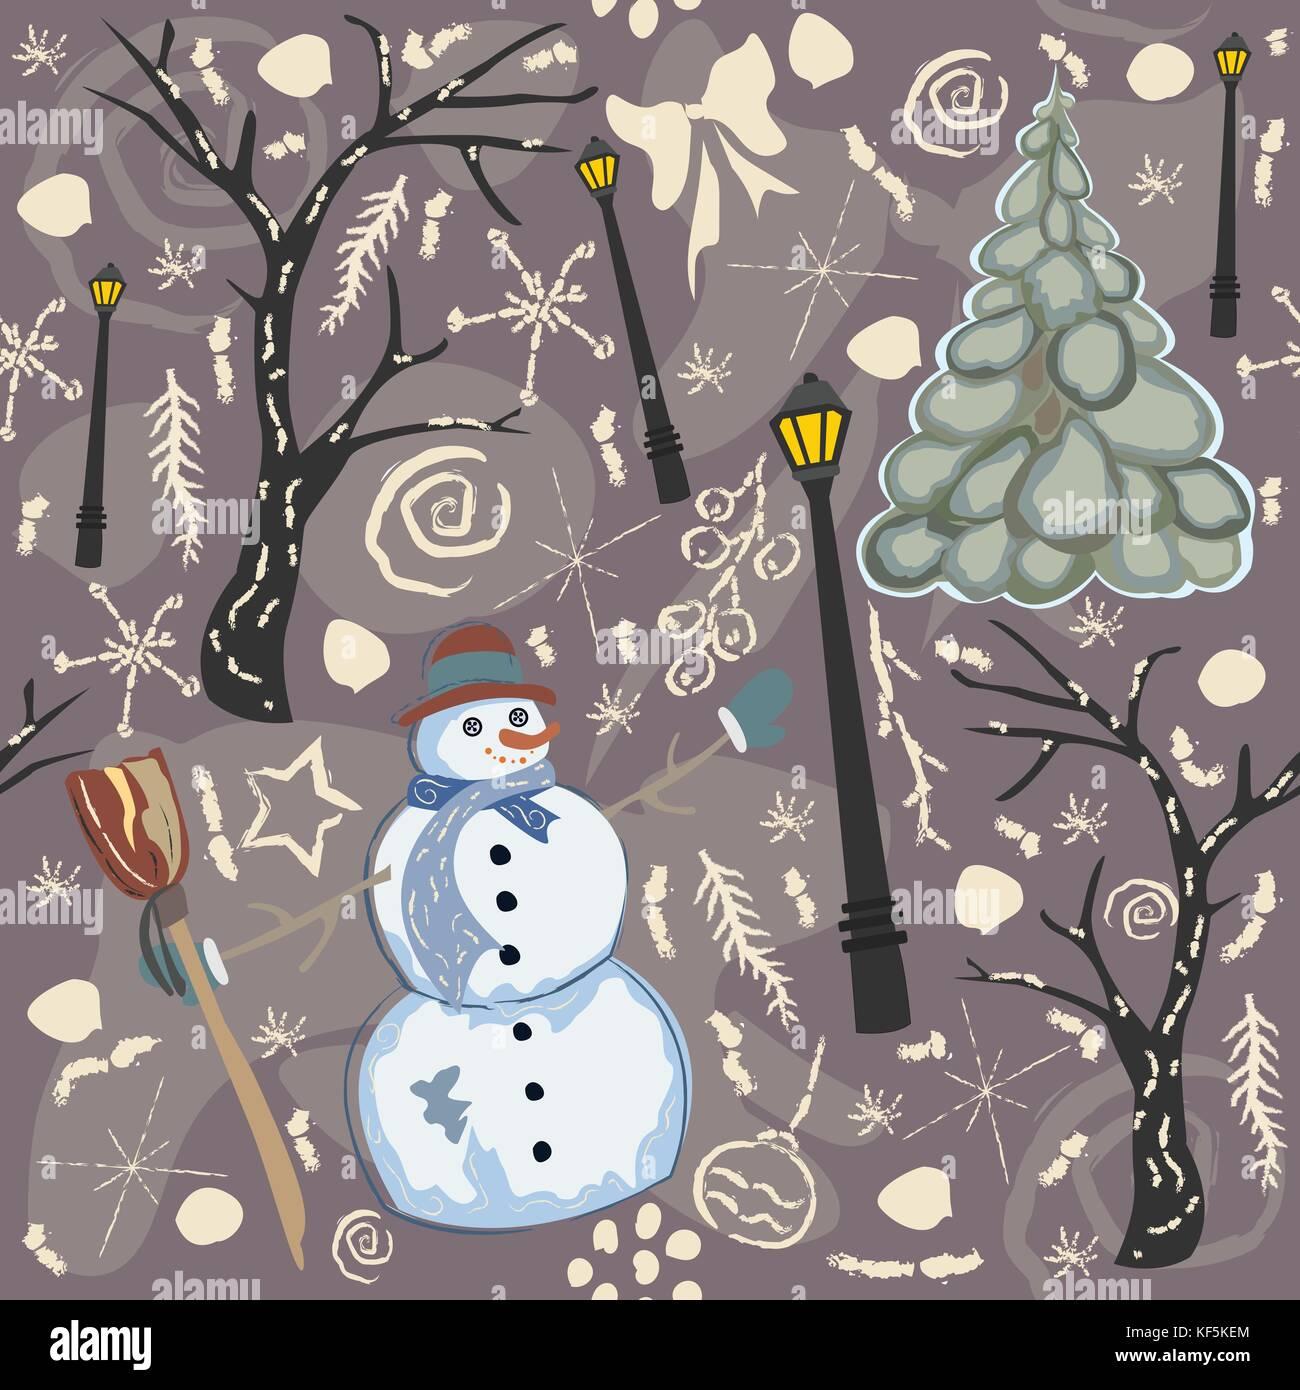 Fancy Doodle Stockfotos & Fancy Doodle Bilder - Alamy